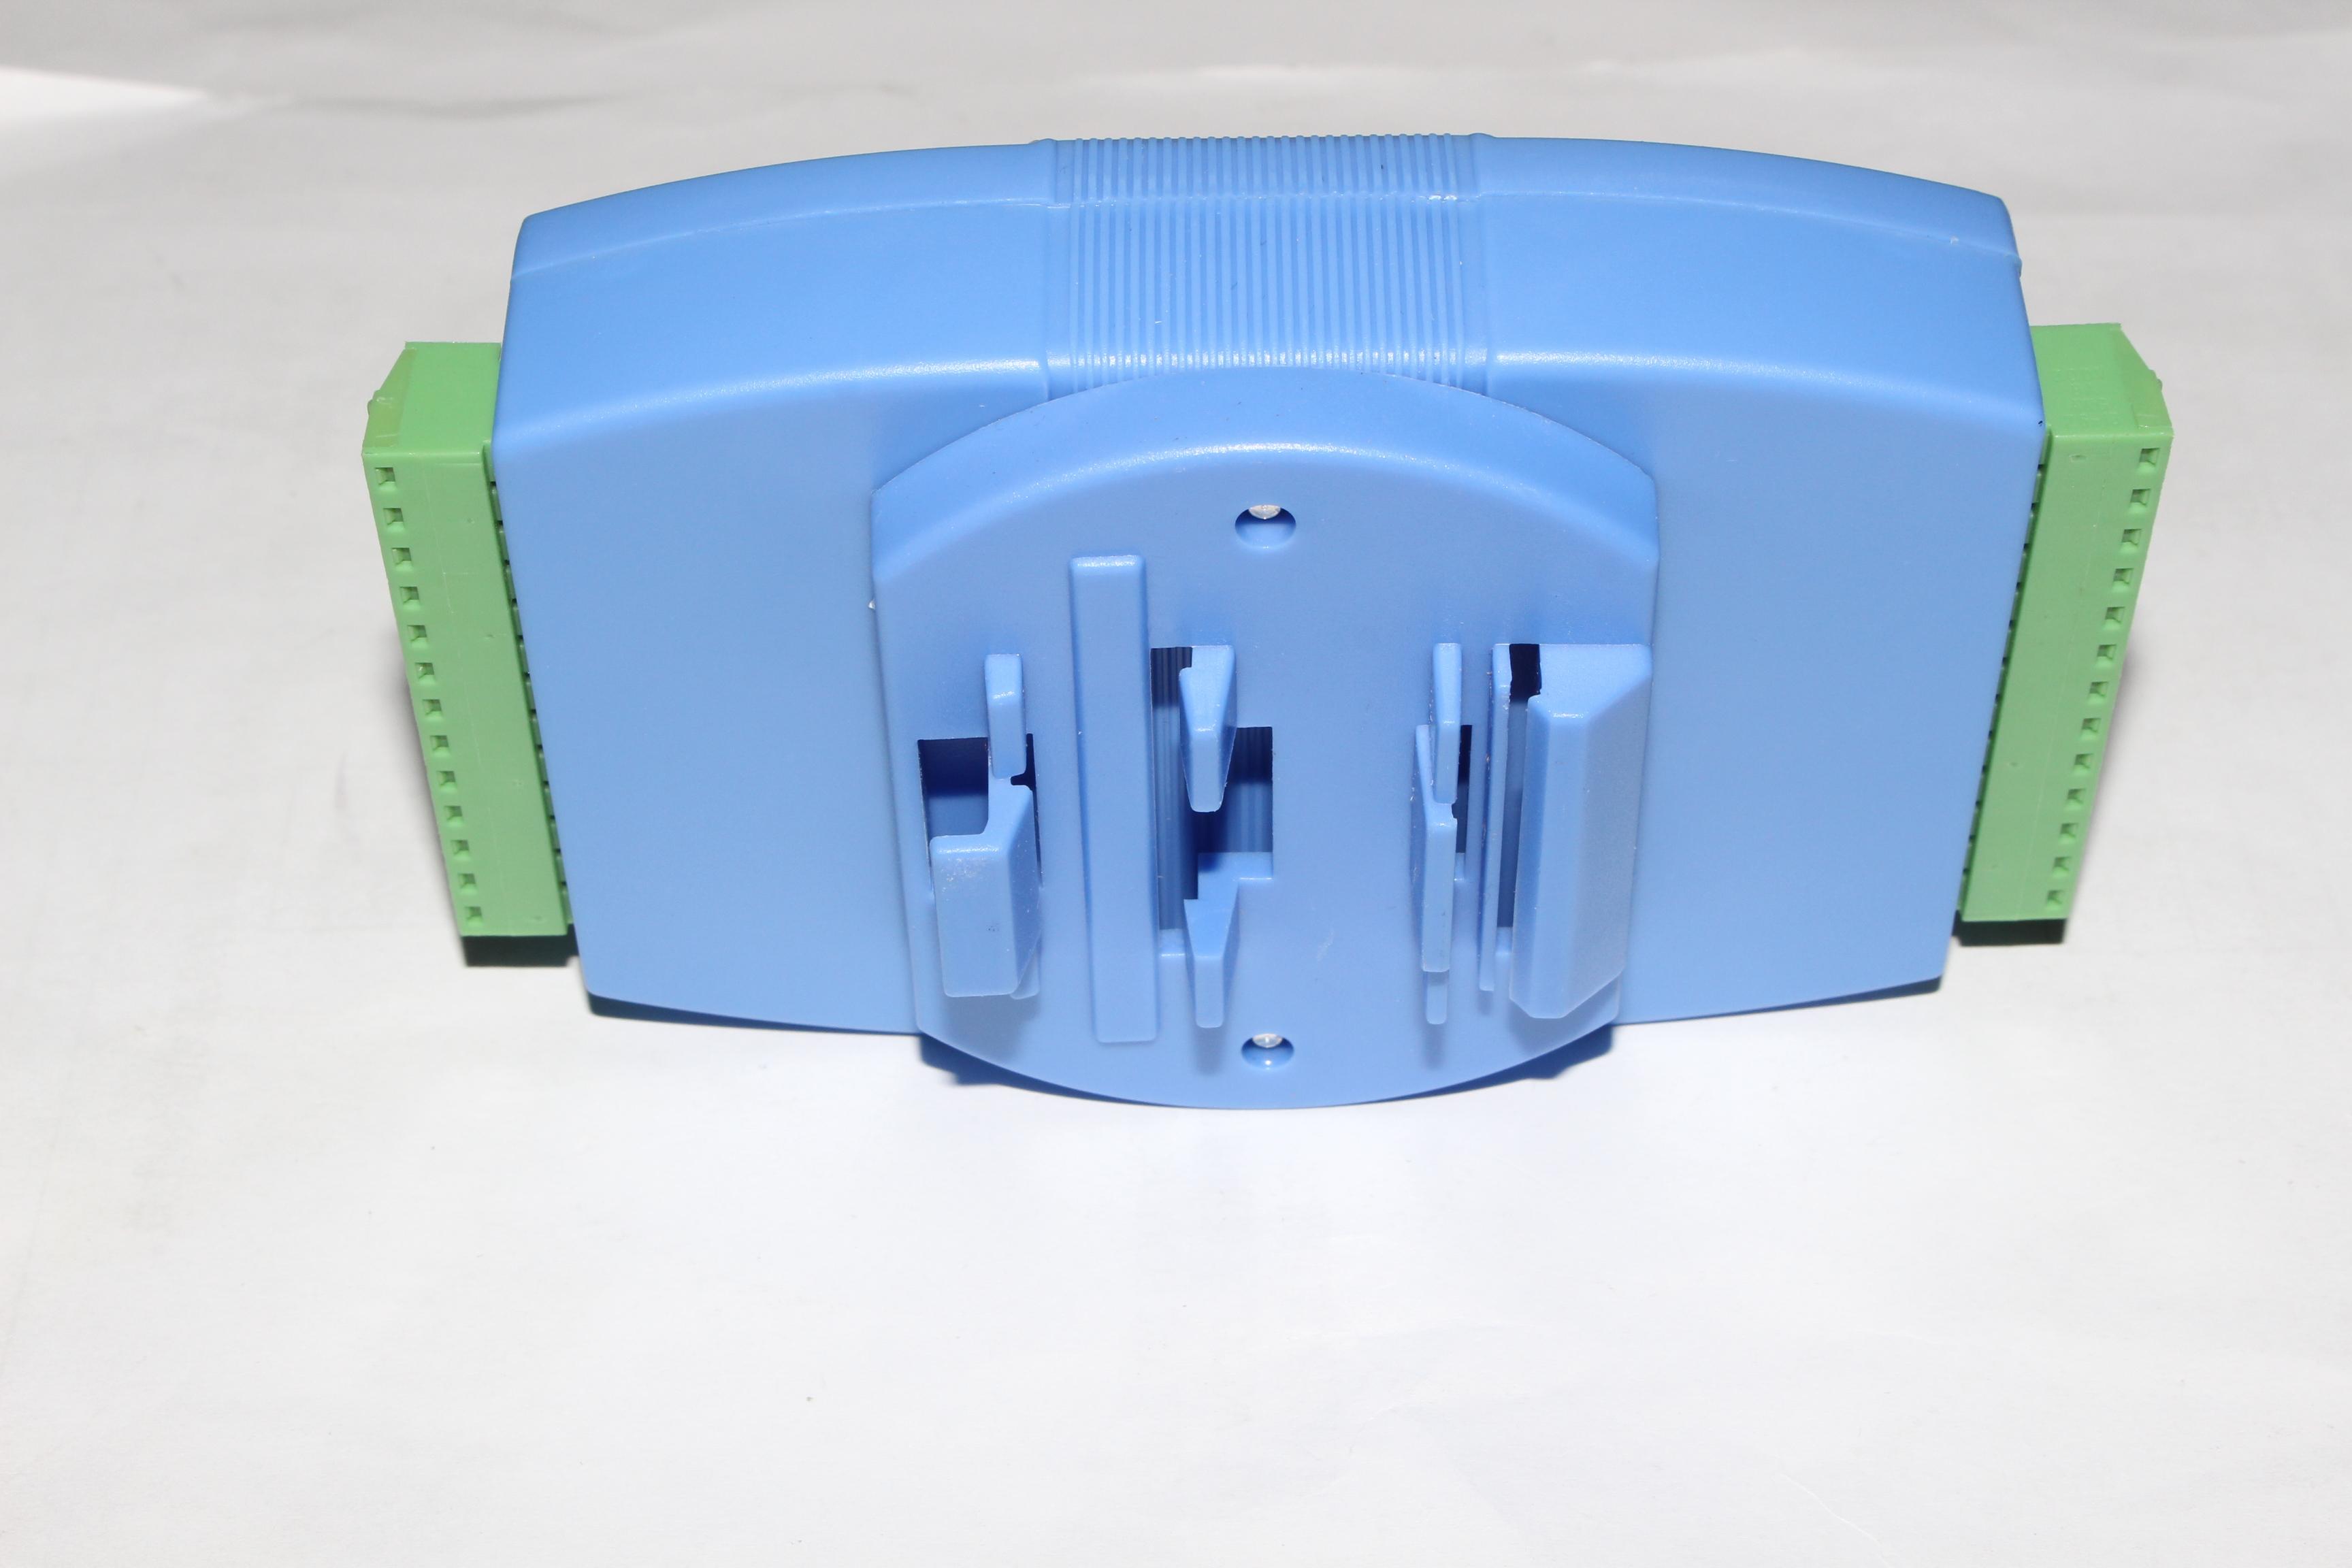 SM1610B-8,RS485,接口,8通道,温湿度,采集模块